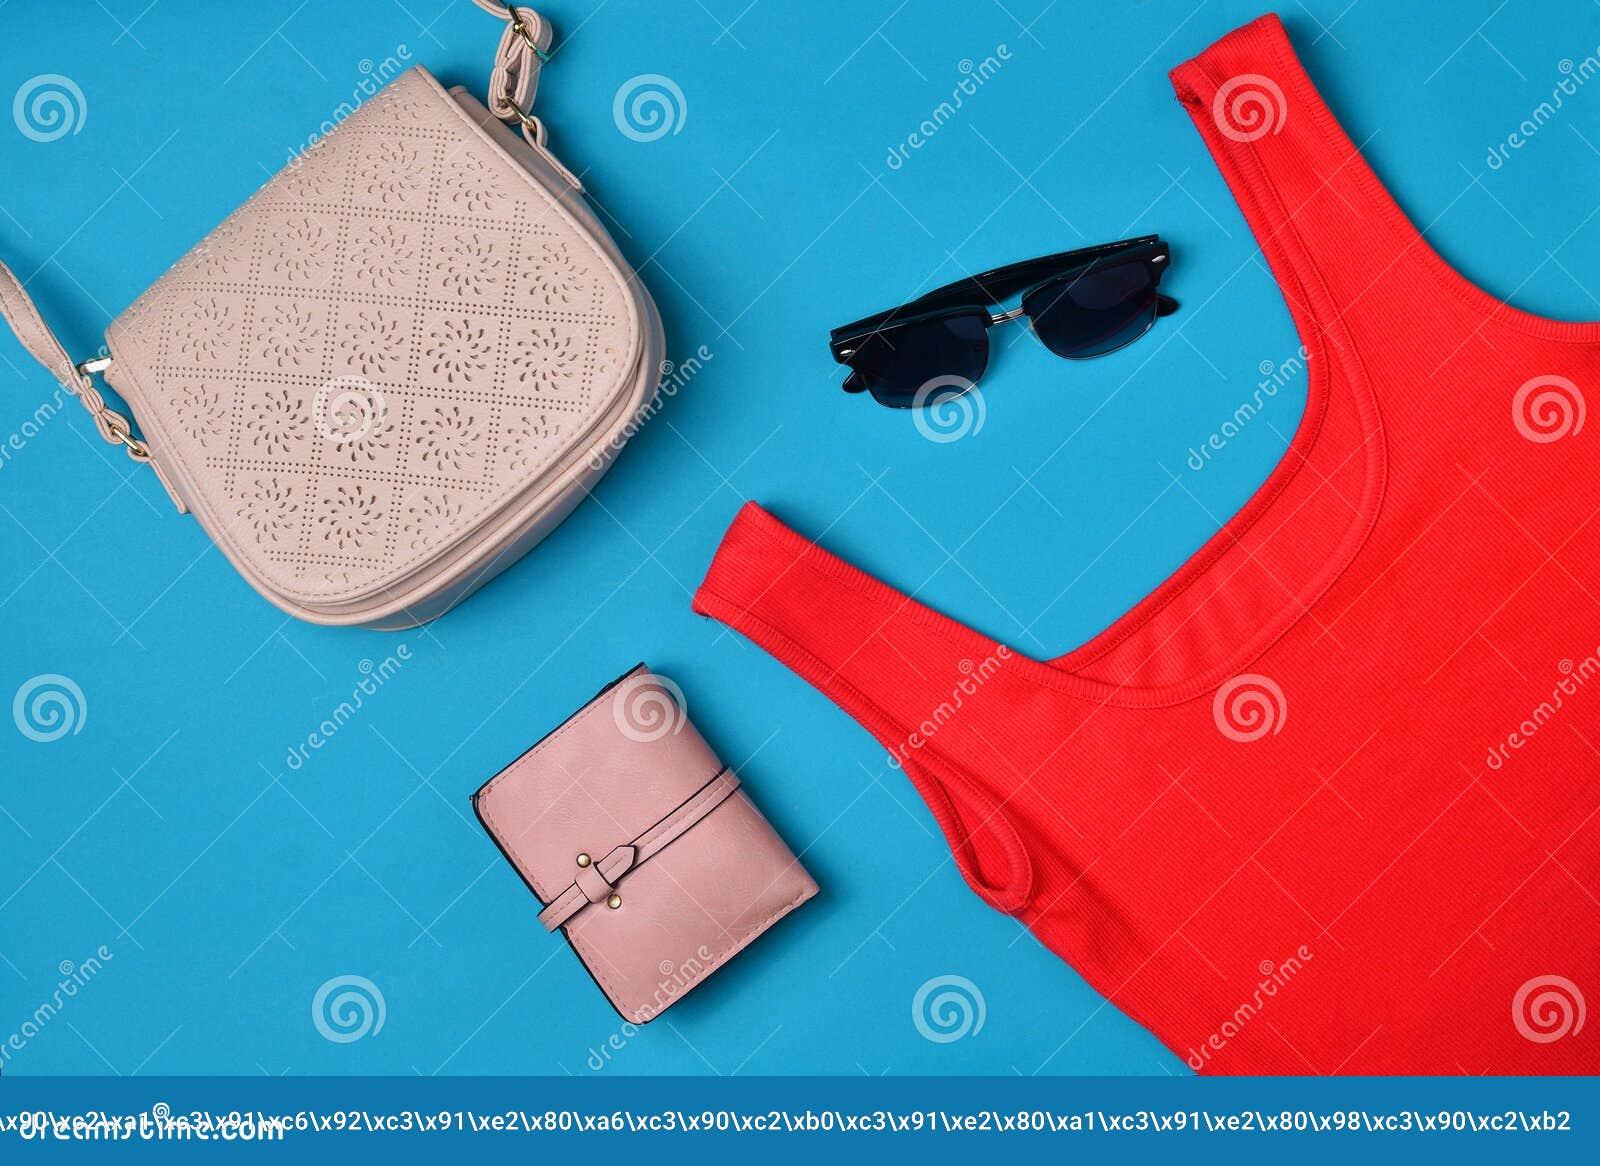 Women& x27 ιματισμός και εξαρτήματα του s που σχεδιάζονται σε ένα μπλε υπόβαθρο Κόκκινη μπλούζα, πορτοφόλι, τσάντα, sunglassesï»